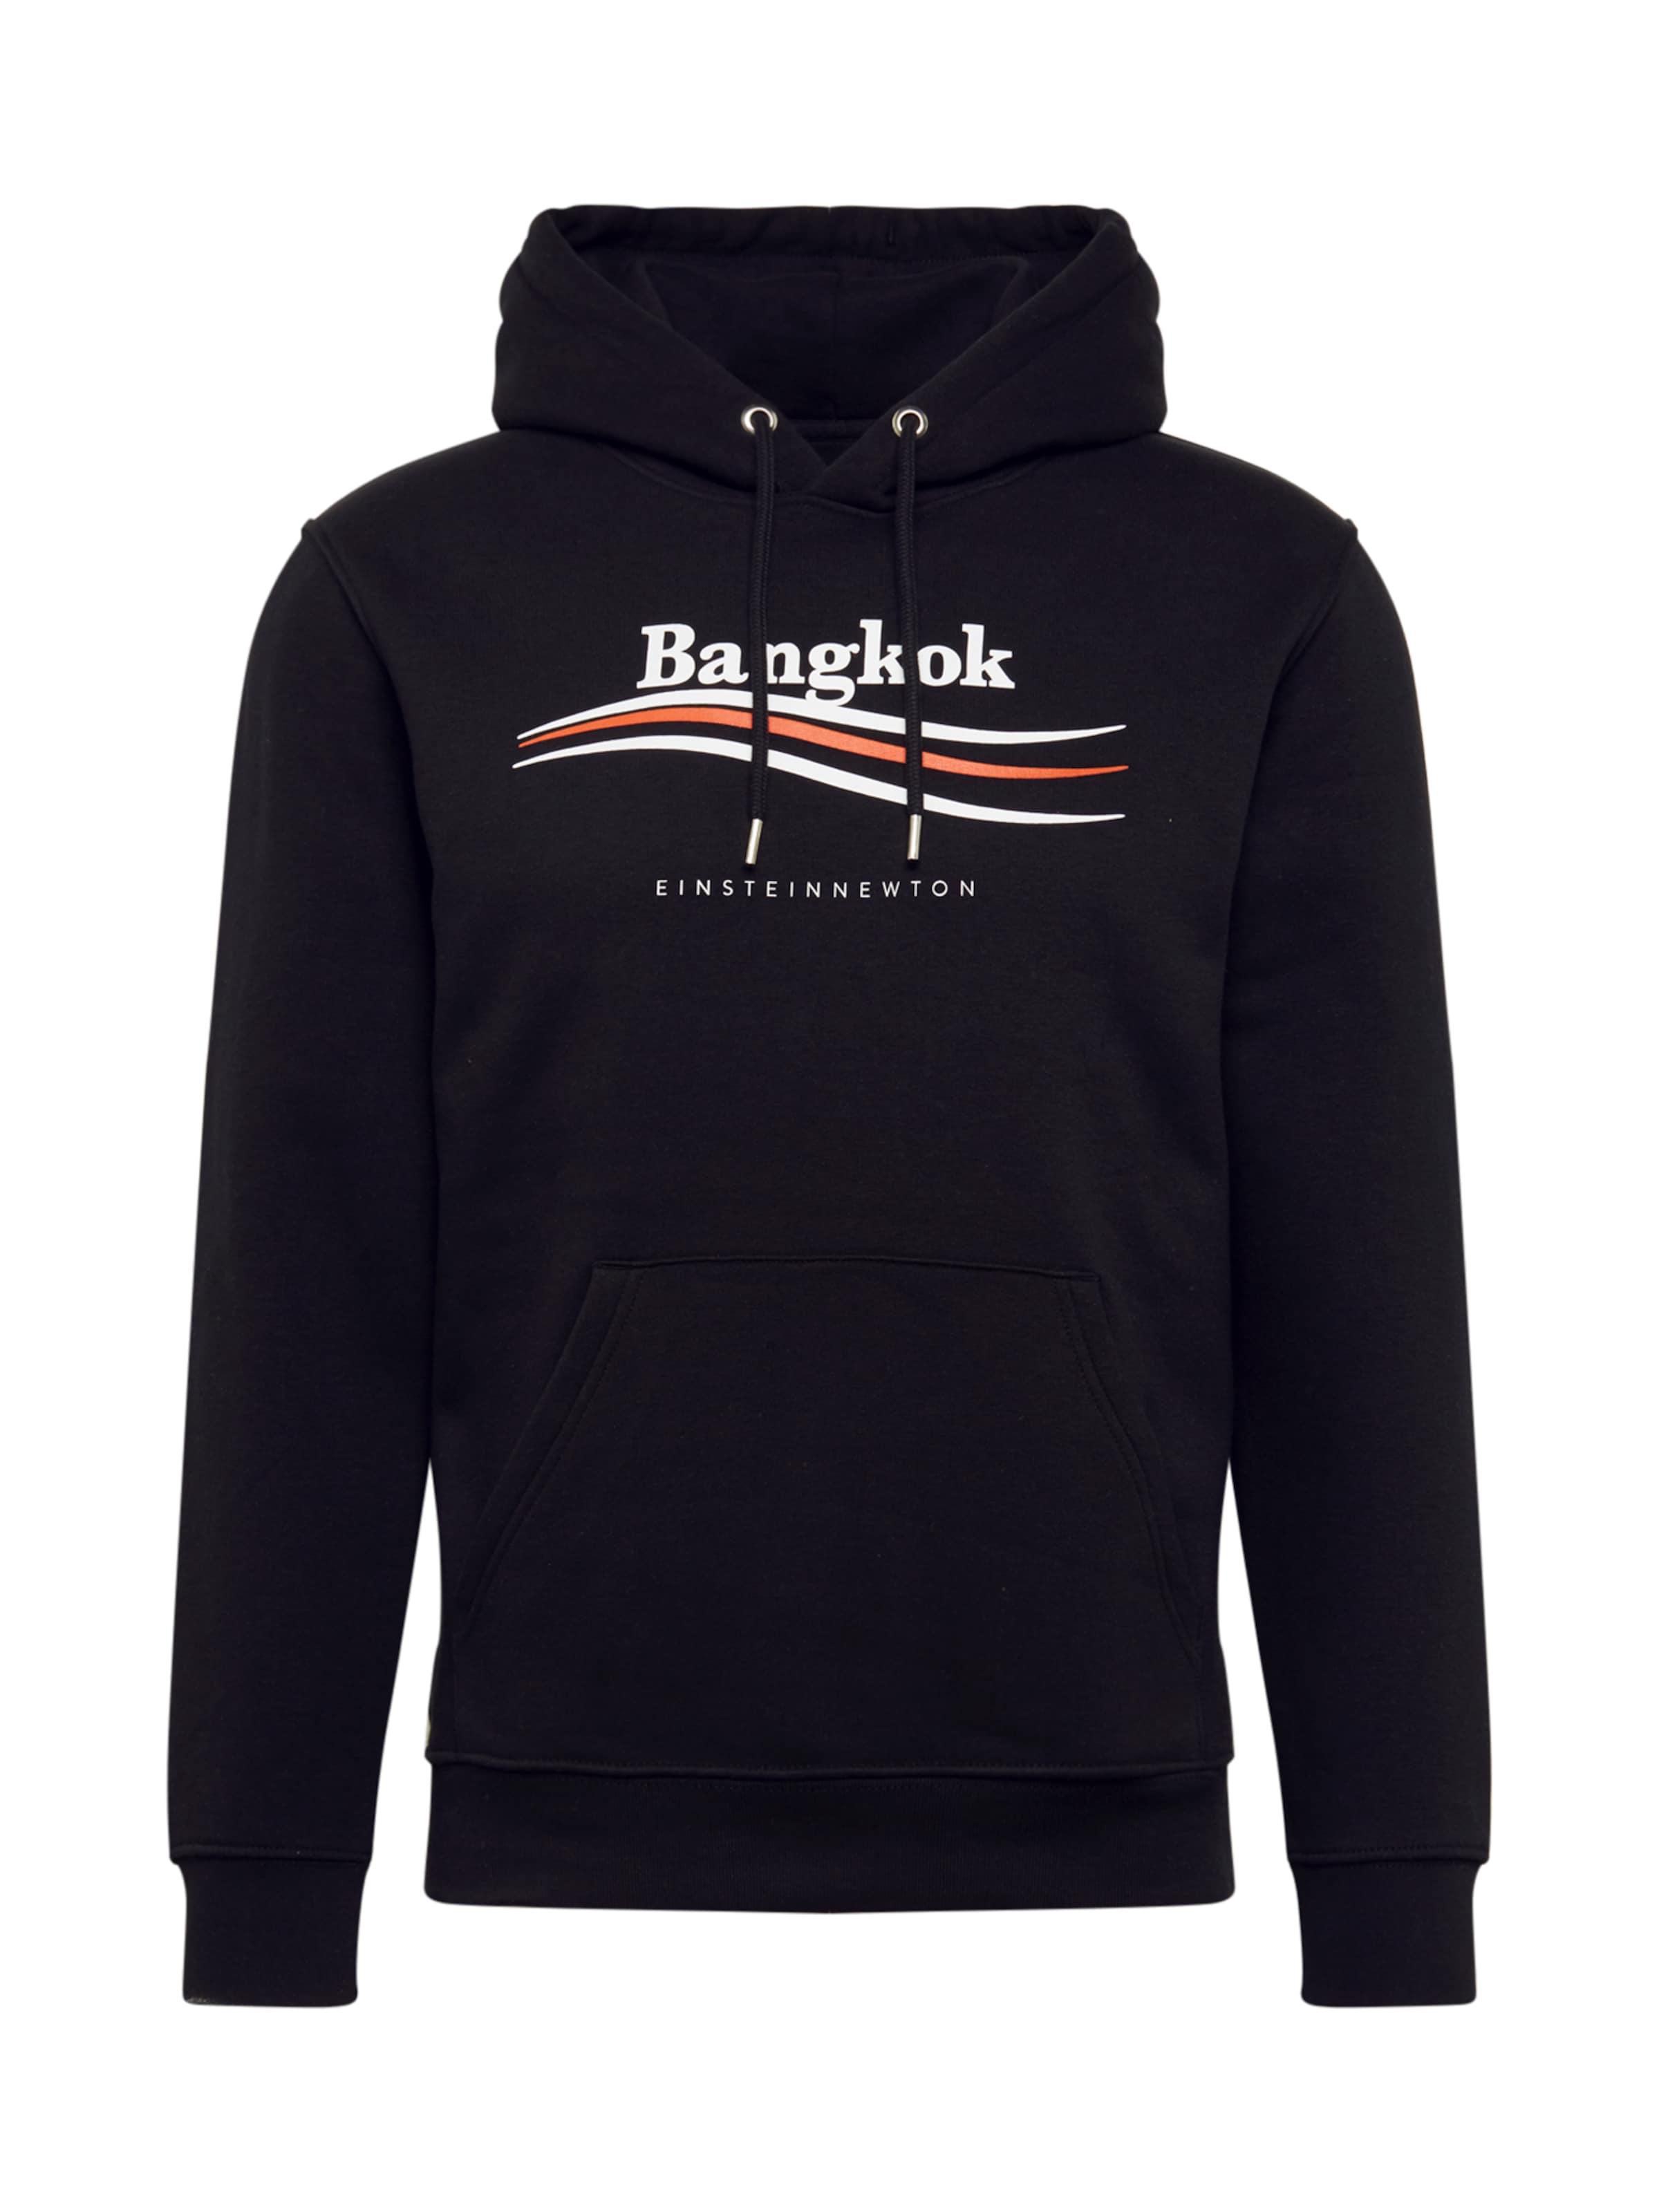 EINSTEIN & NEWTON Sweatshirt 'Bangkok Nico Tin' i svart / vit